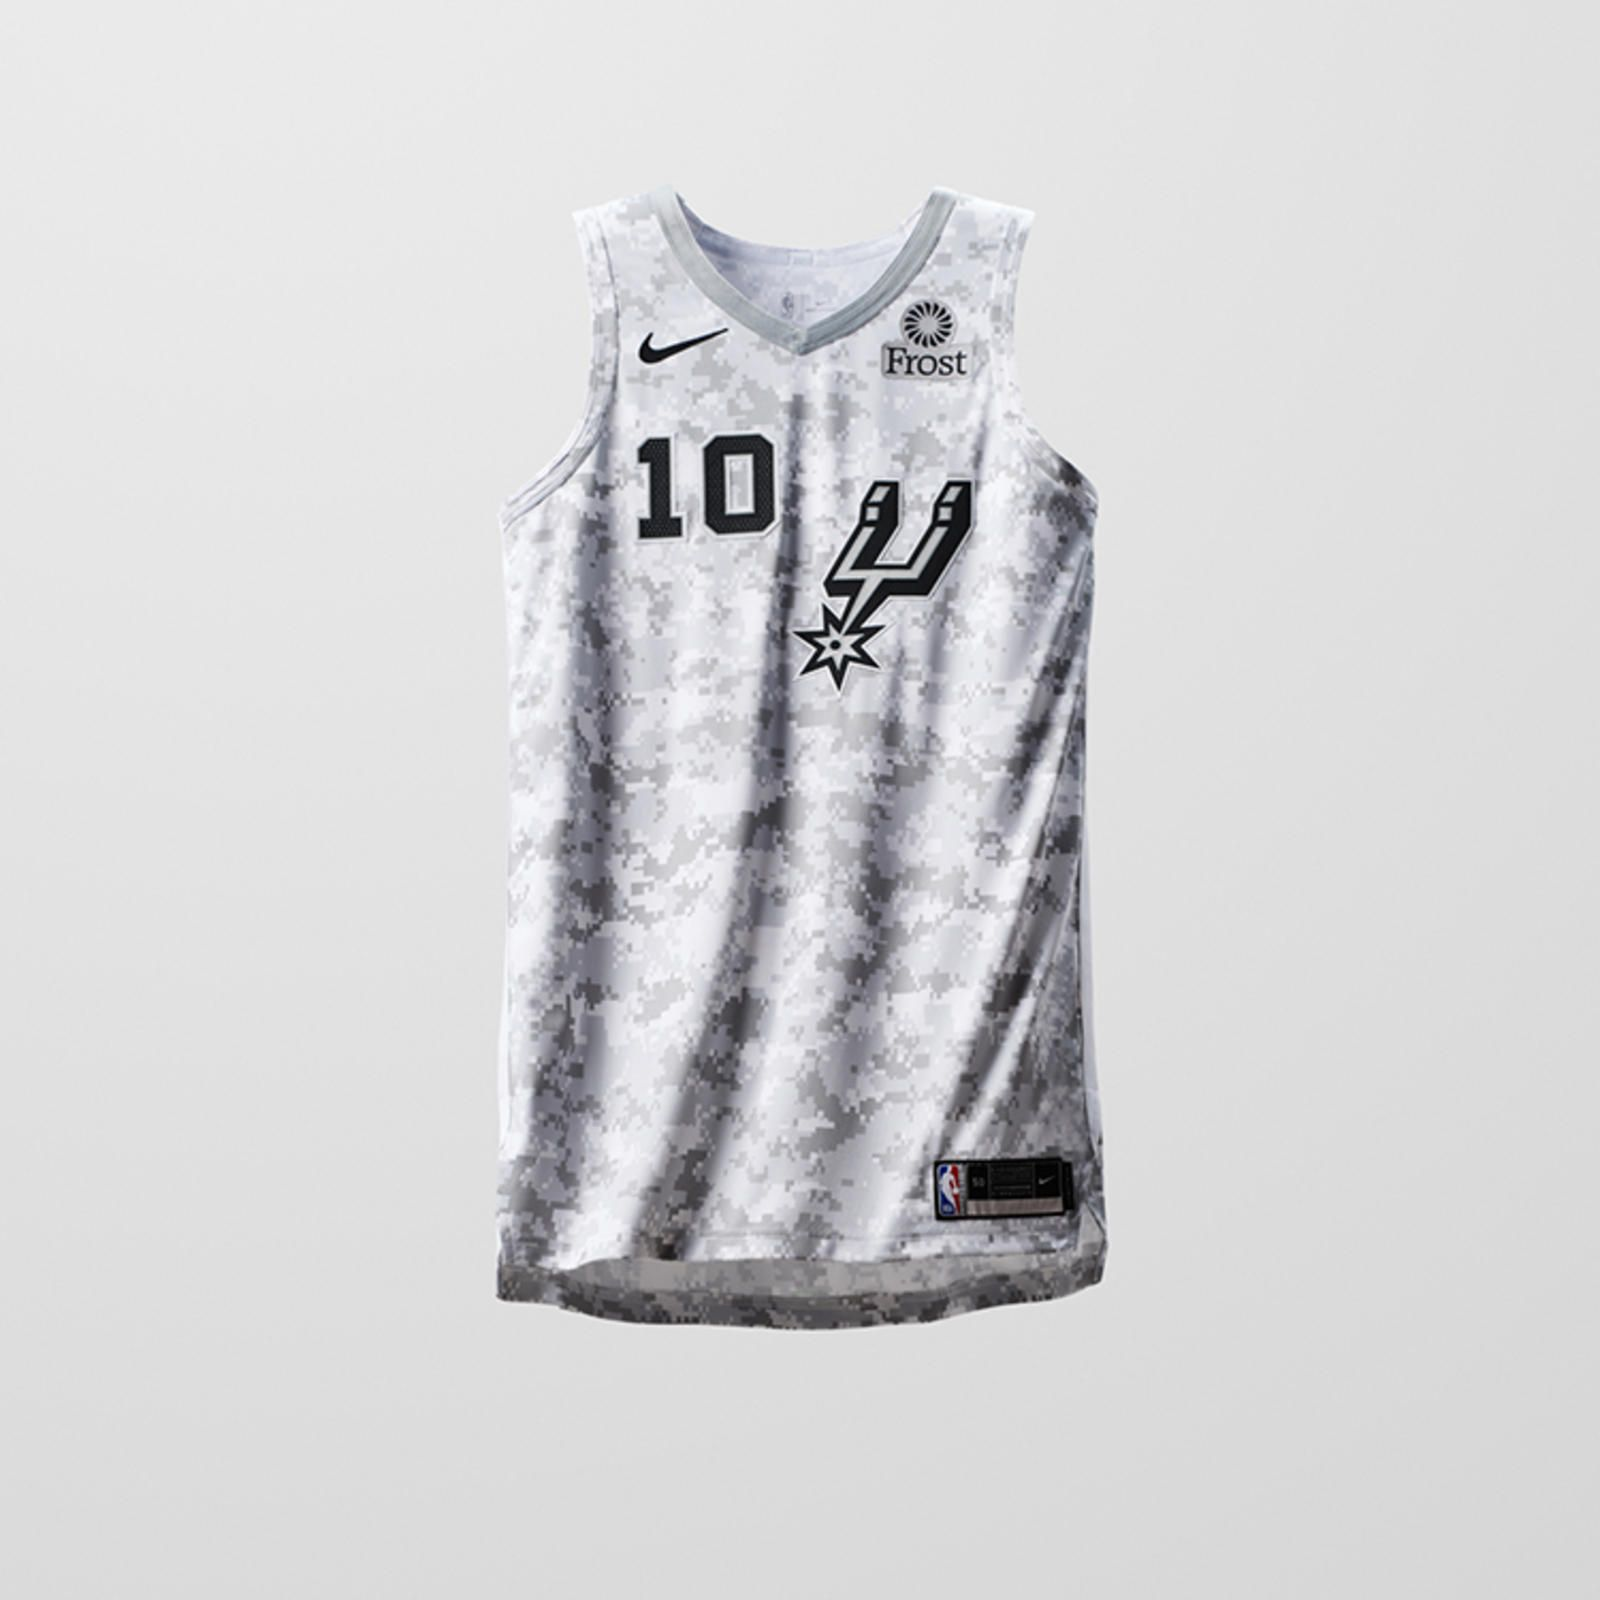 902ac64b13037 Introducing the nike x nba earned edition uniforms 0 – Artofit